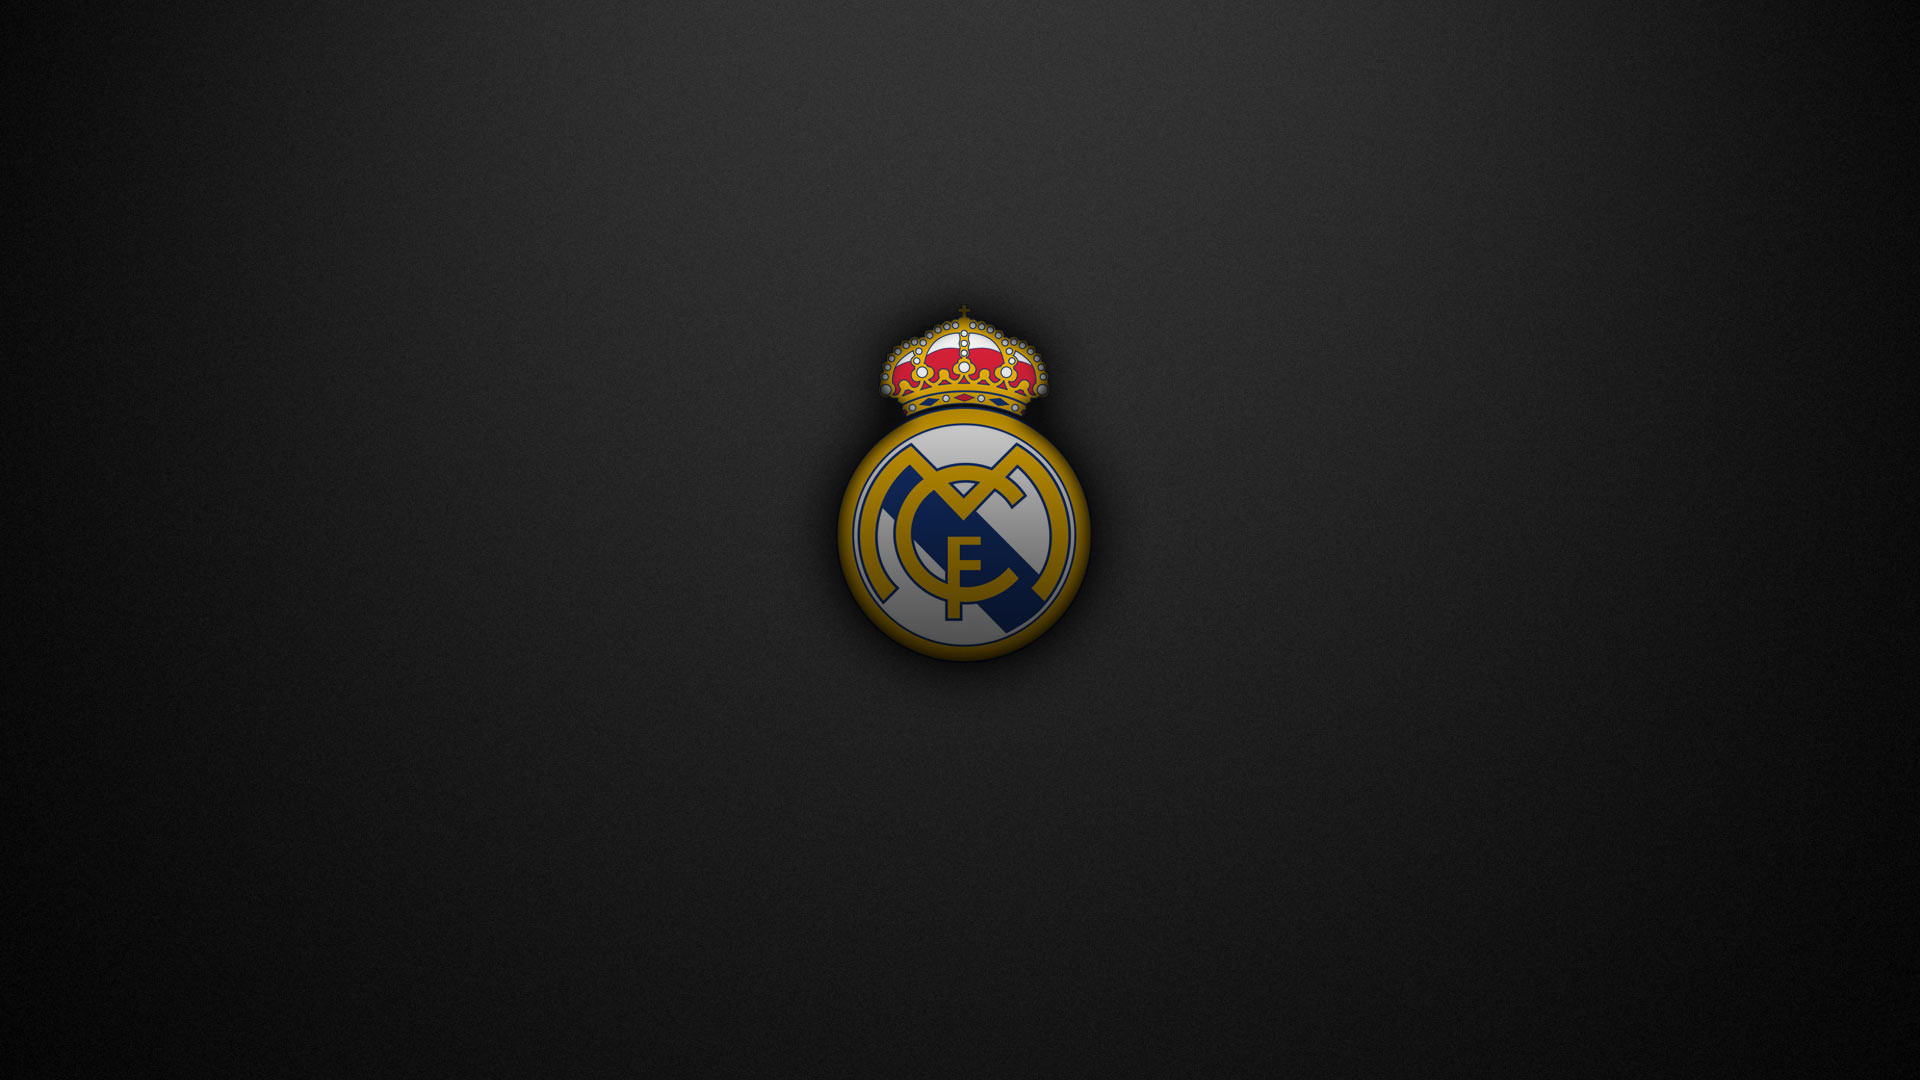 Soccer | Full HD Wallpapers, download 1080p desktop backgrounds